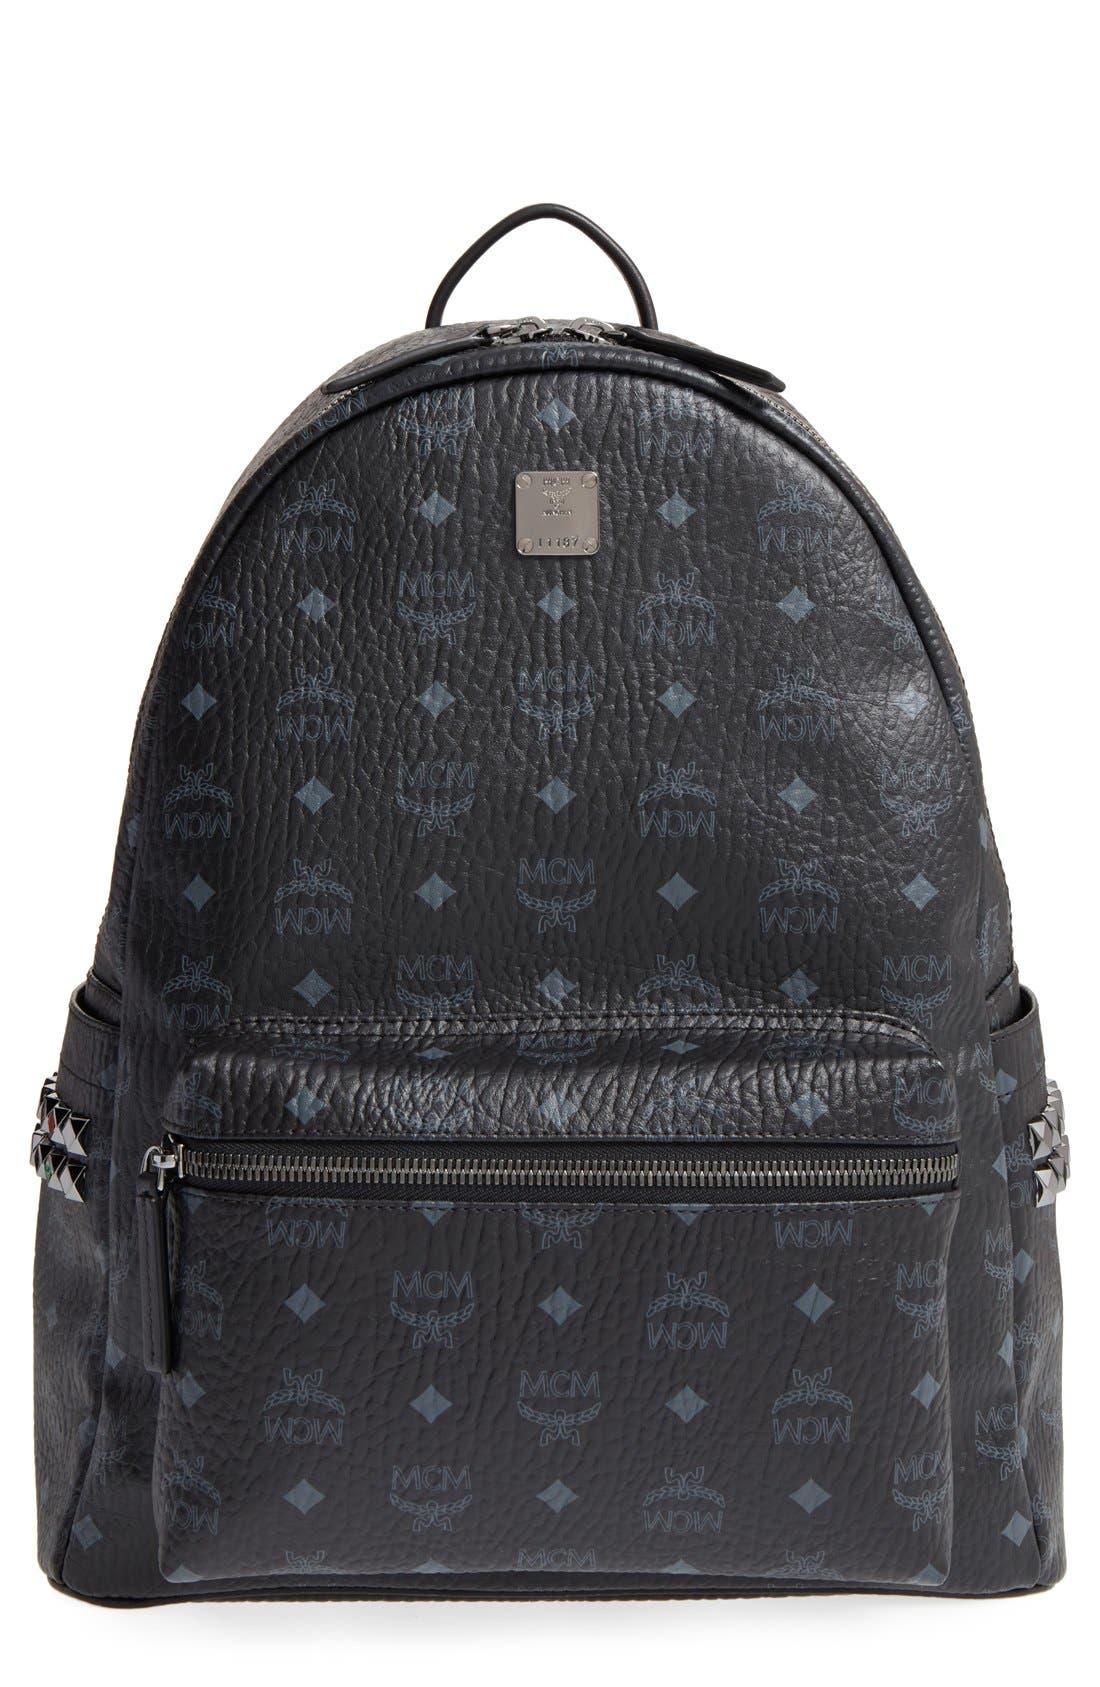 Medium Stark Visetos Coated Canvas Backpack, Main, color, BLACK